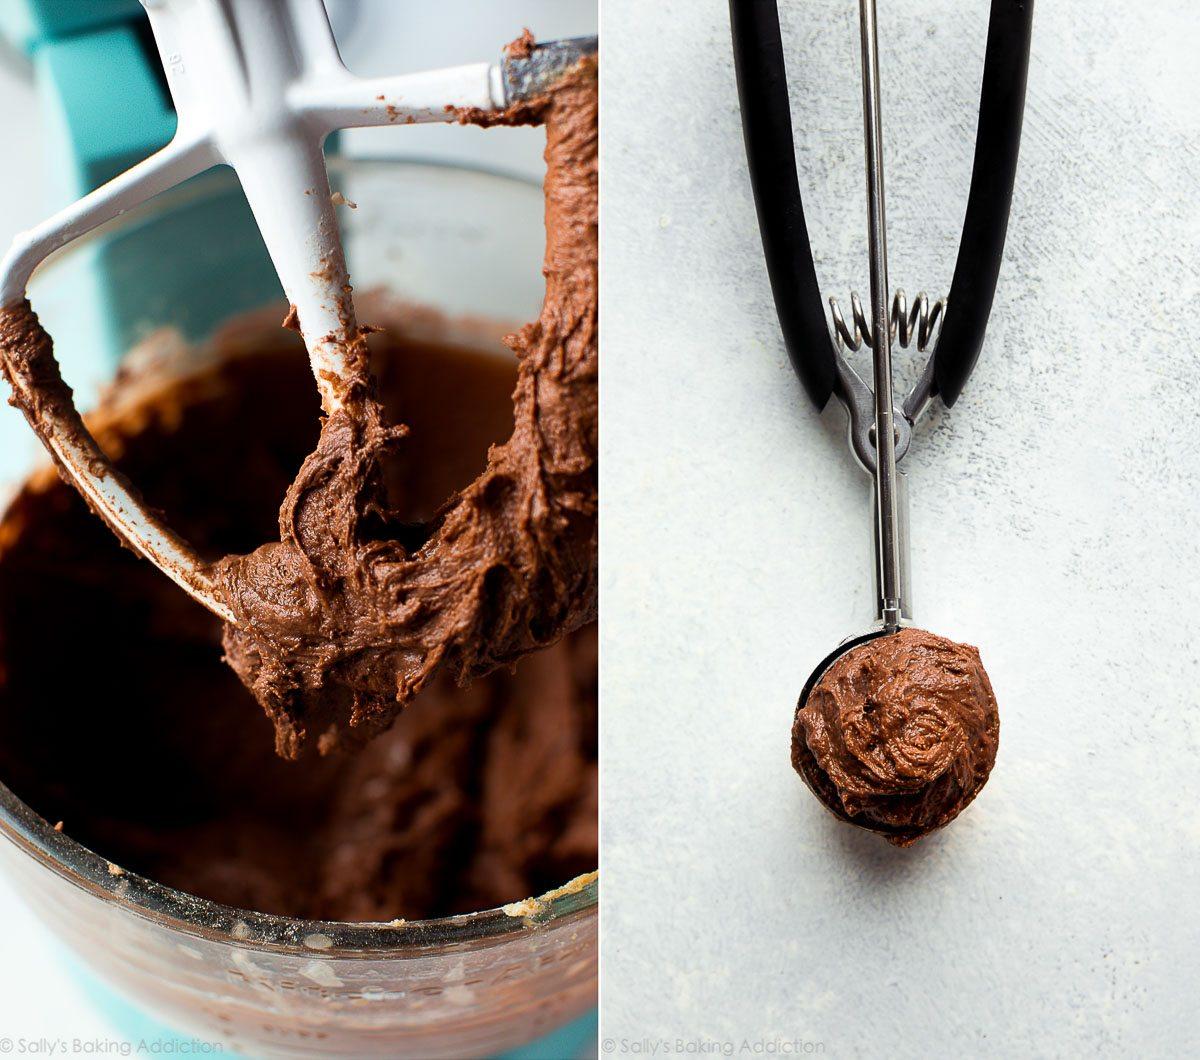 How to make chocolate whoopie pies on sallysbakingaddiction.com